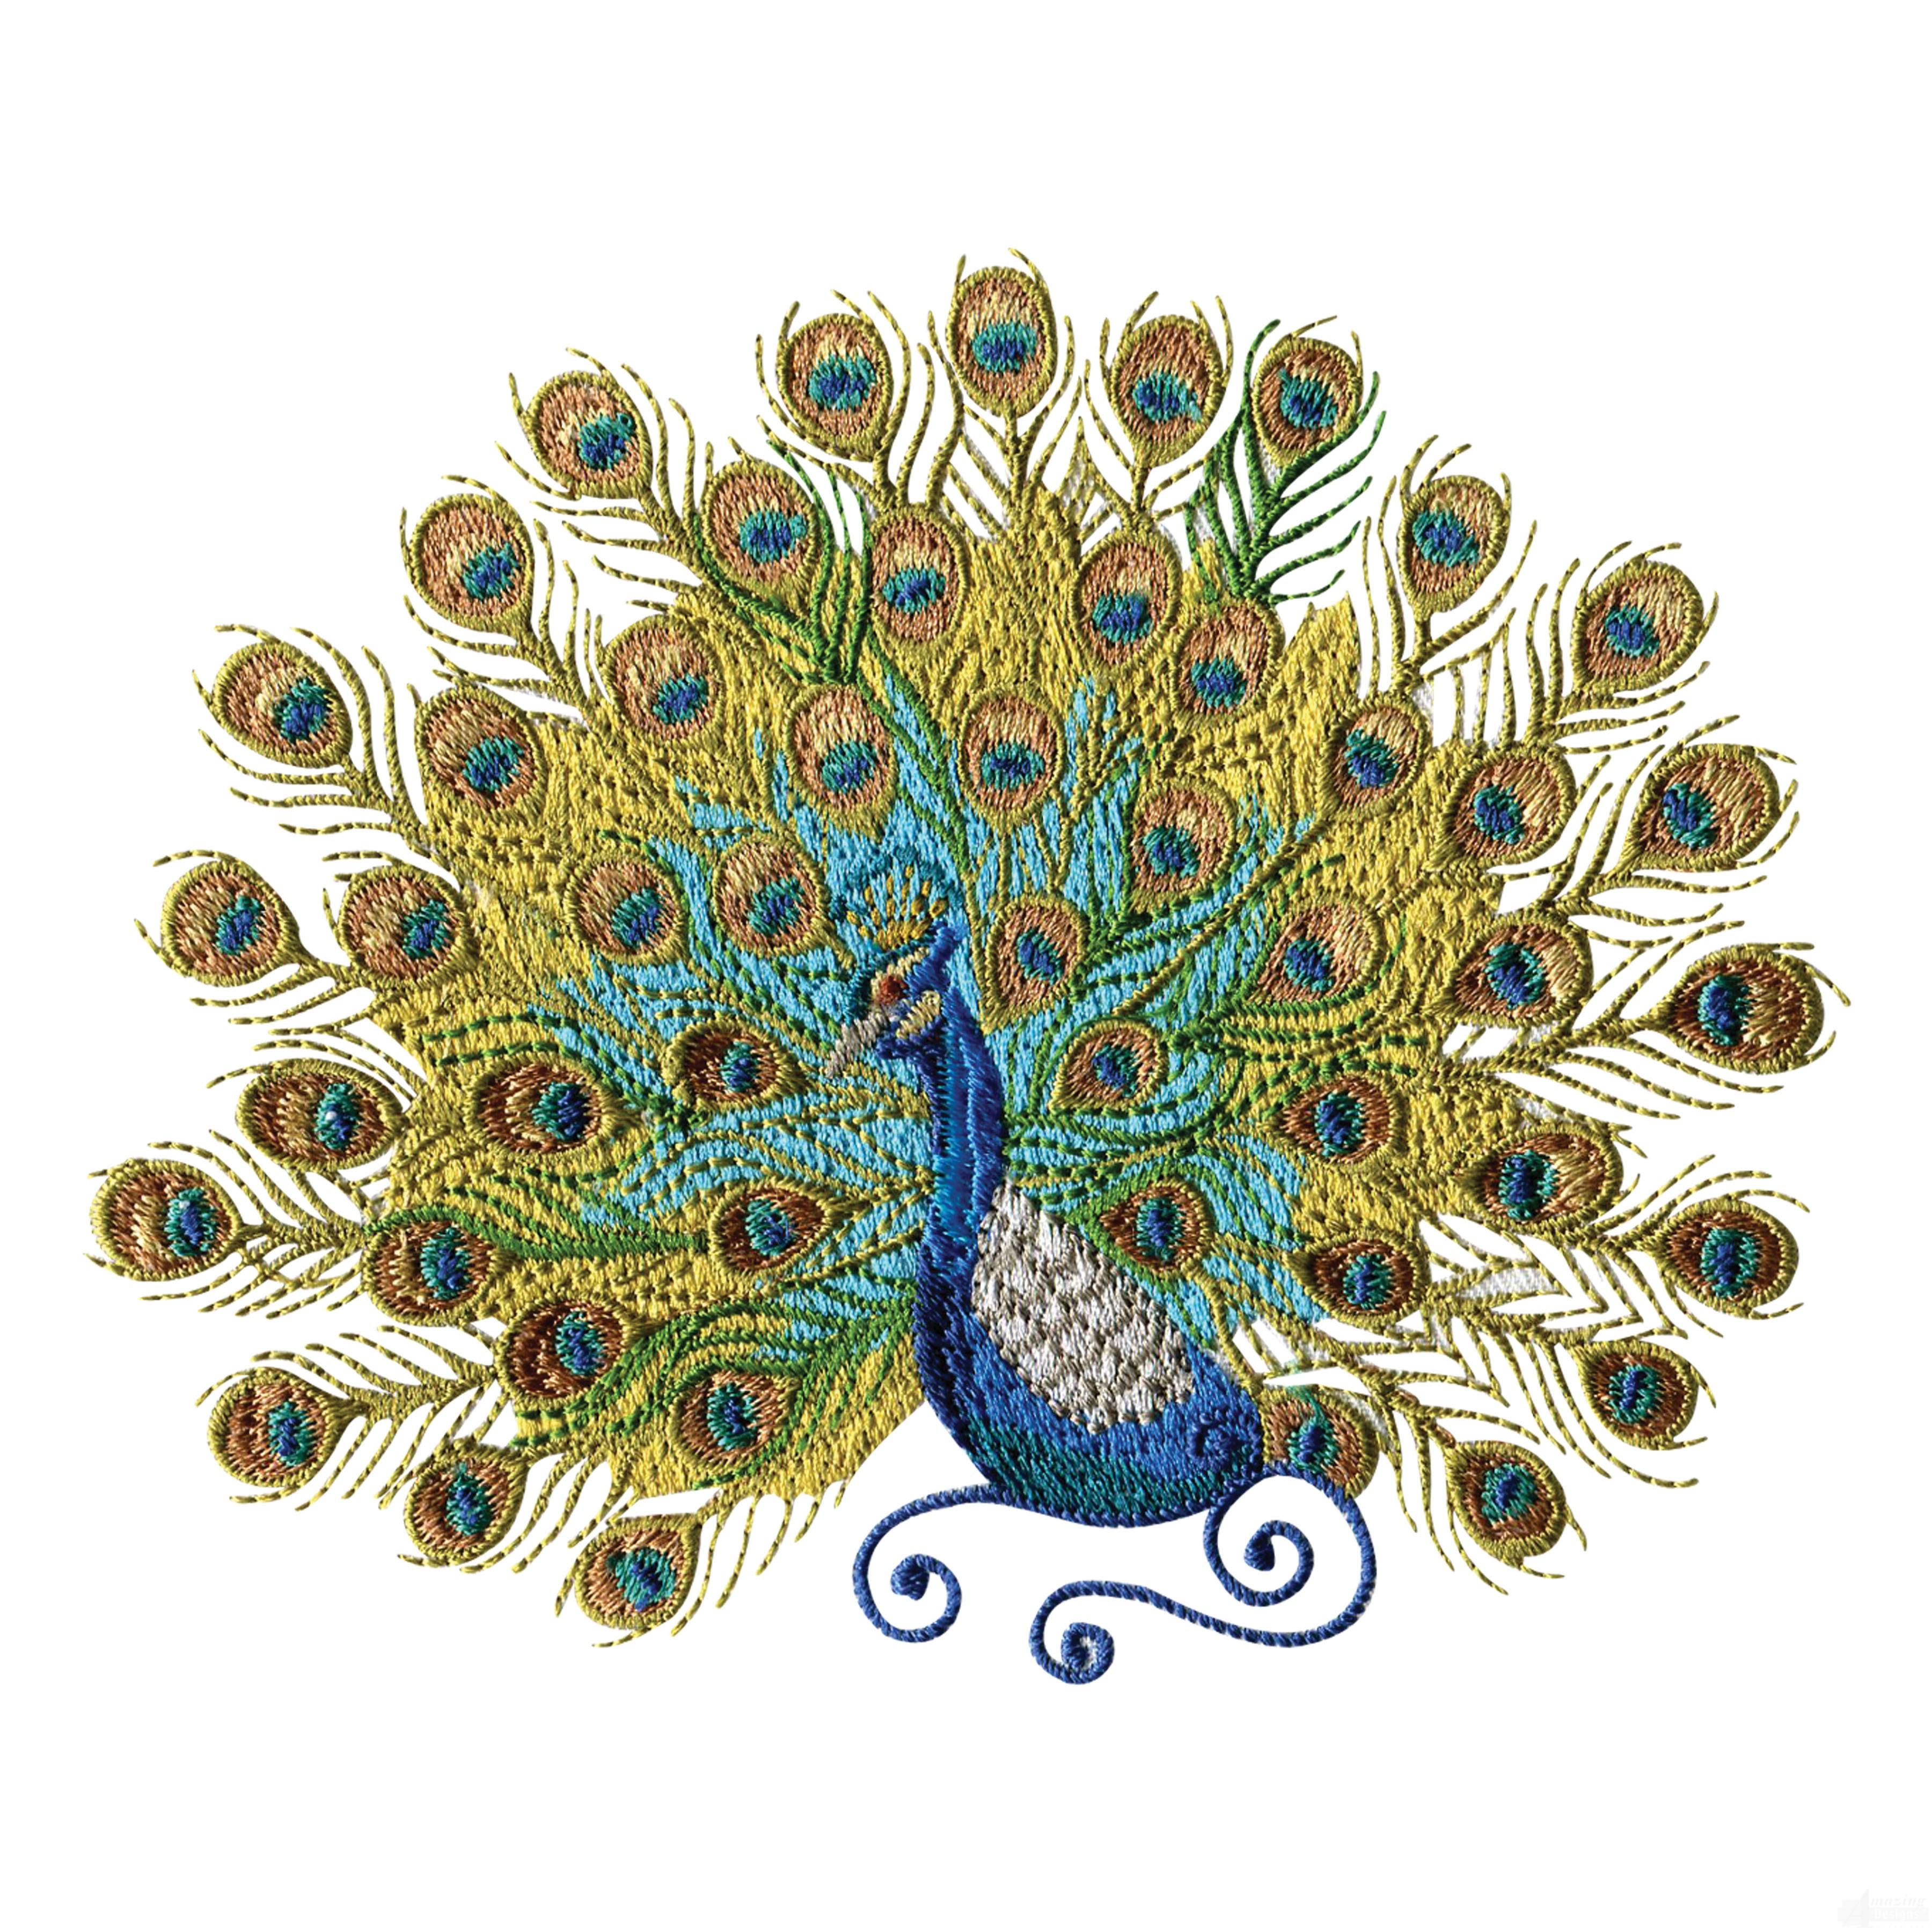 Swnpa126 Peacock Embroidery Design